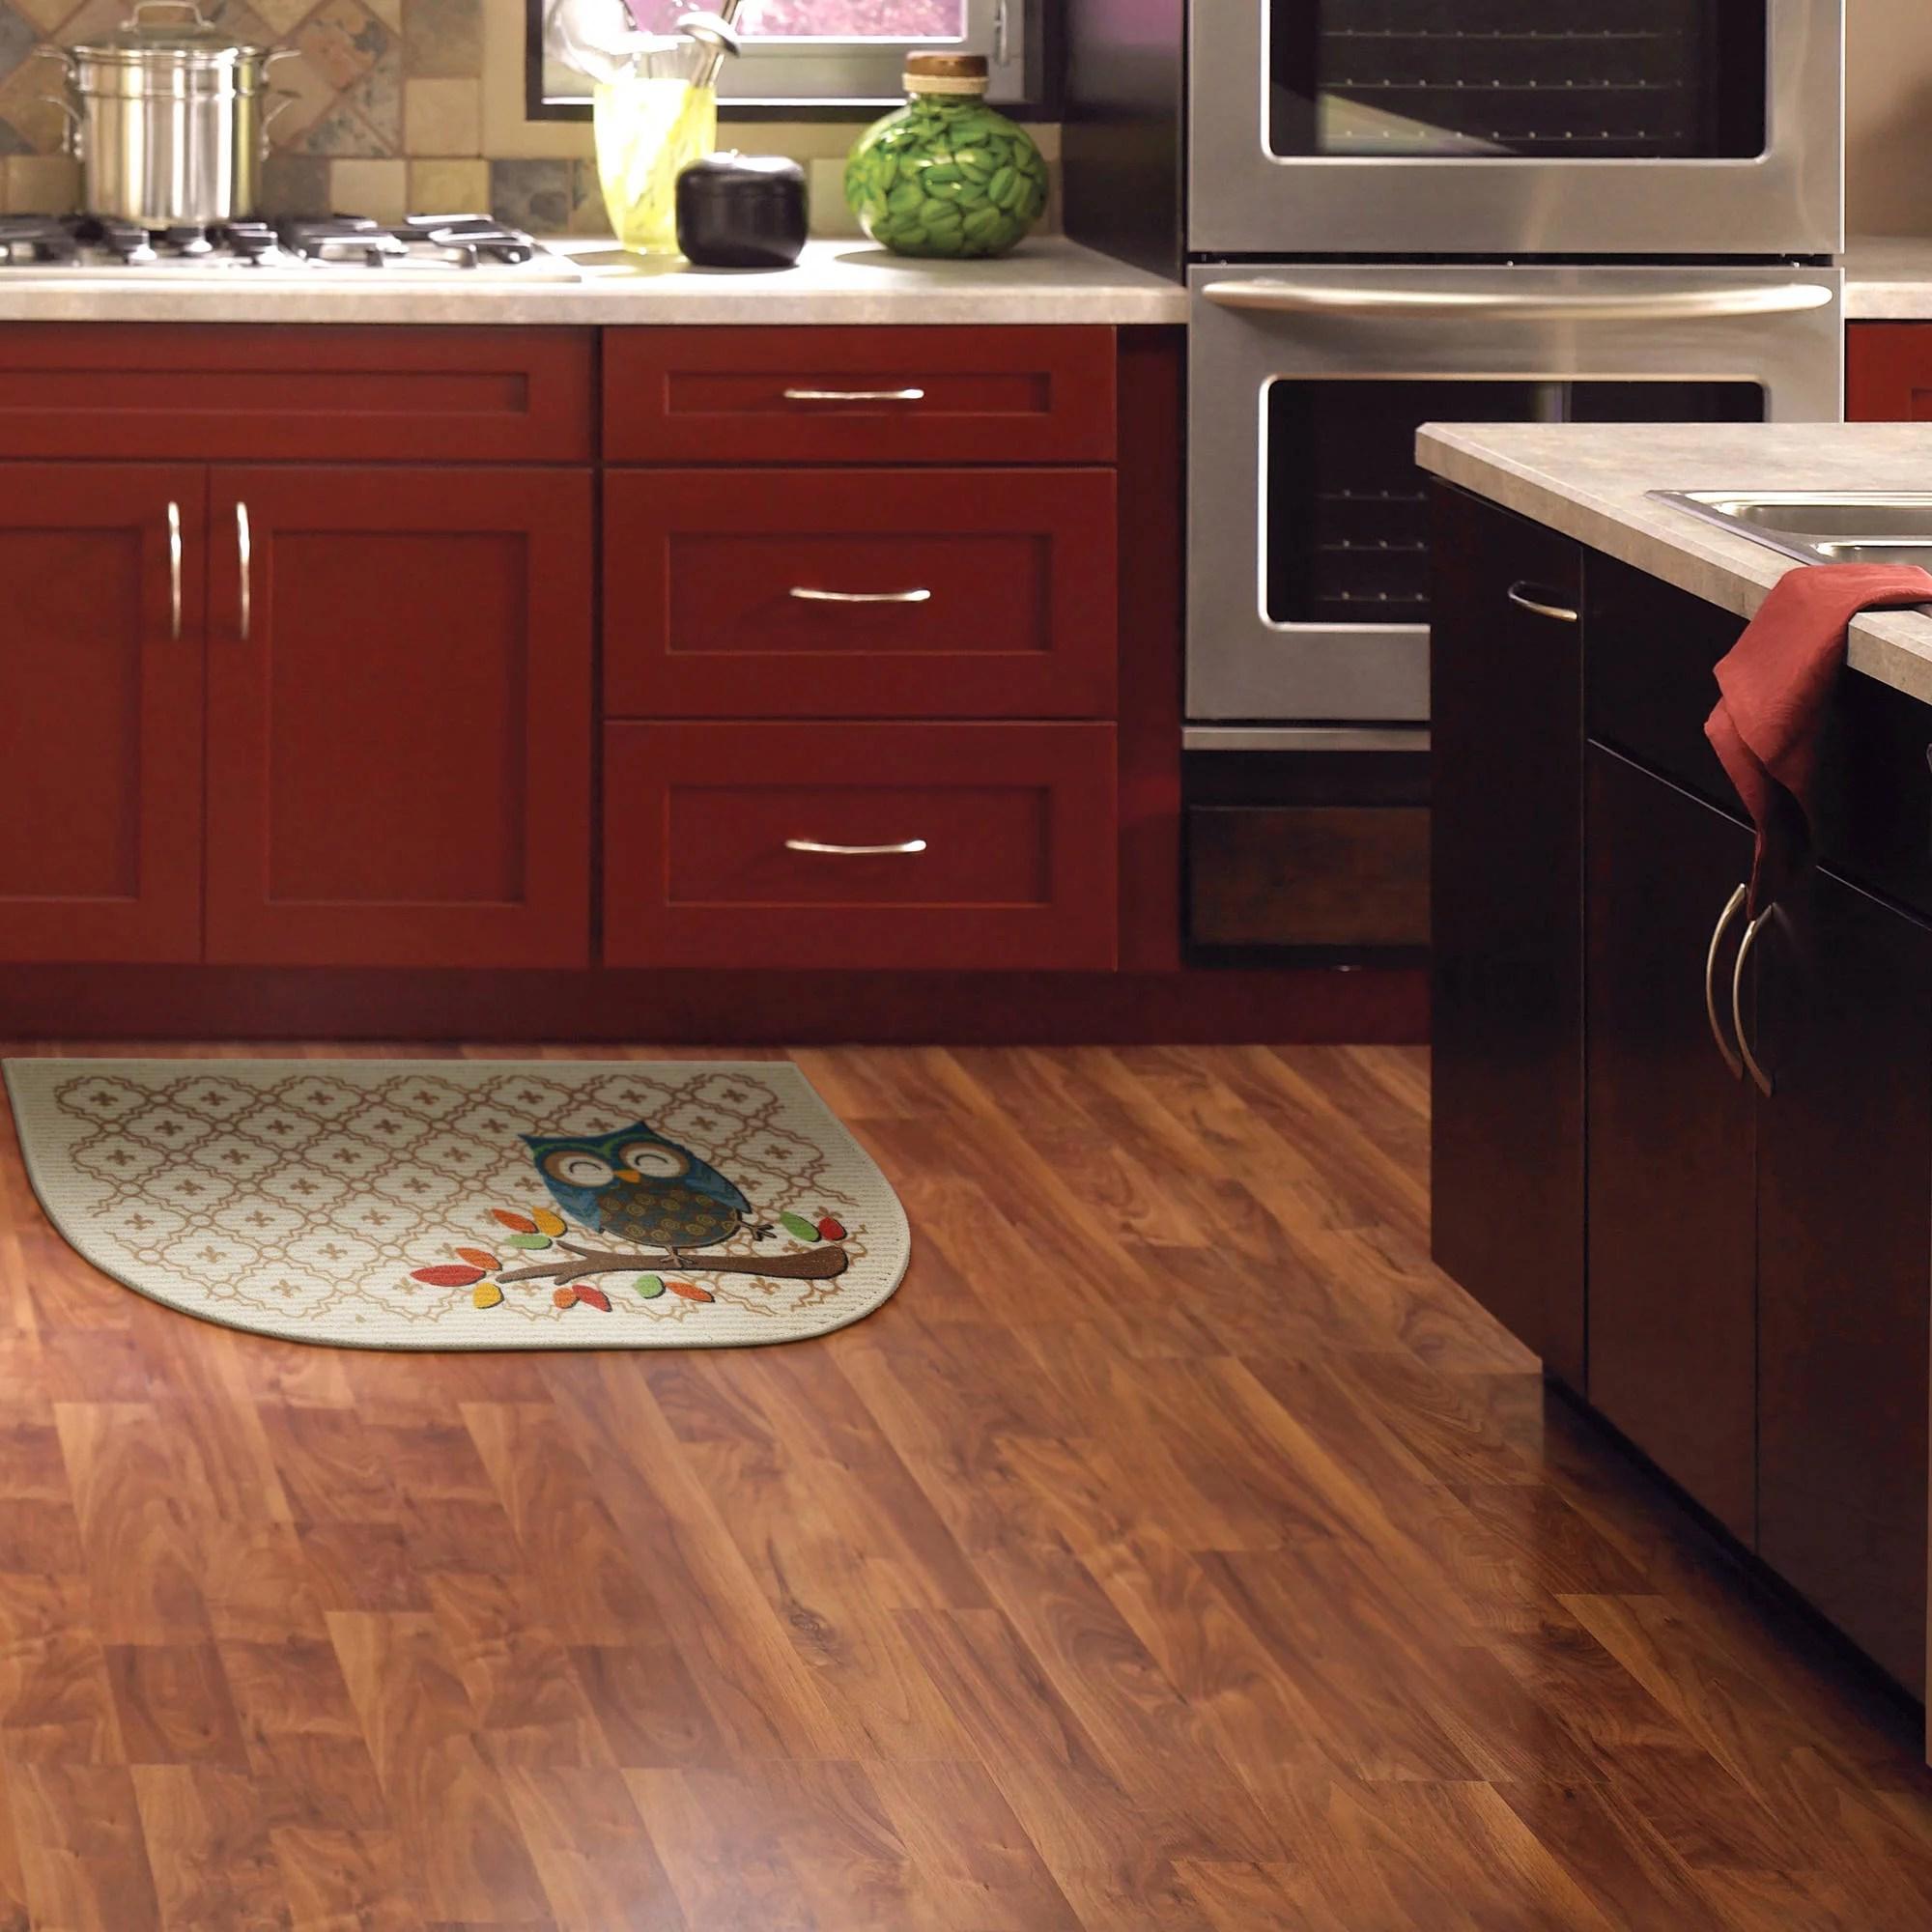 owl kitchen rugs stainless steel sink with drainboard mainstays trellis slice rug walmart com